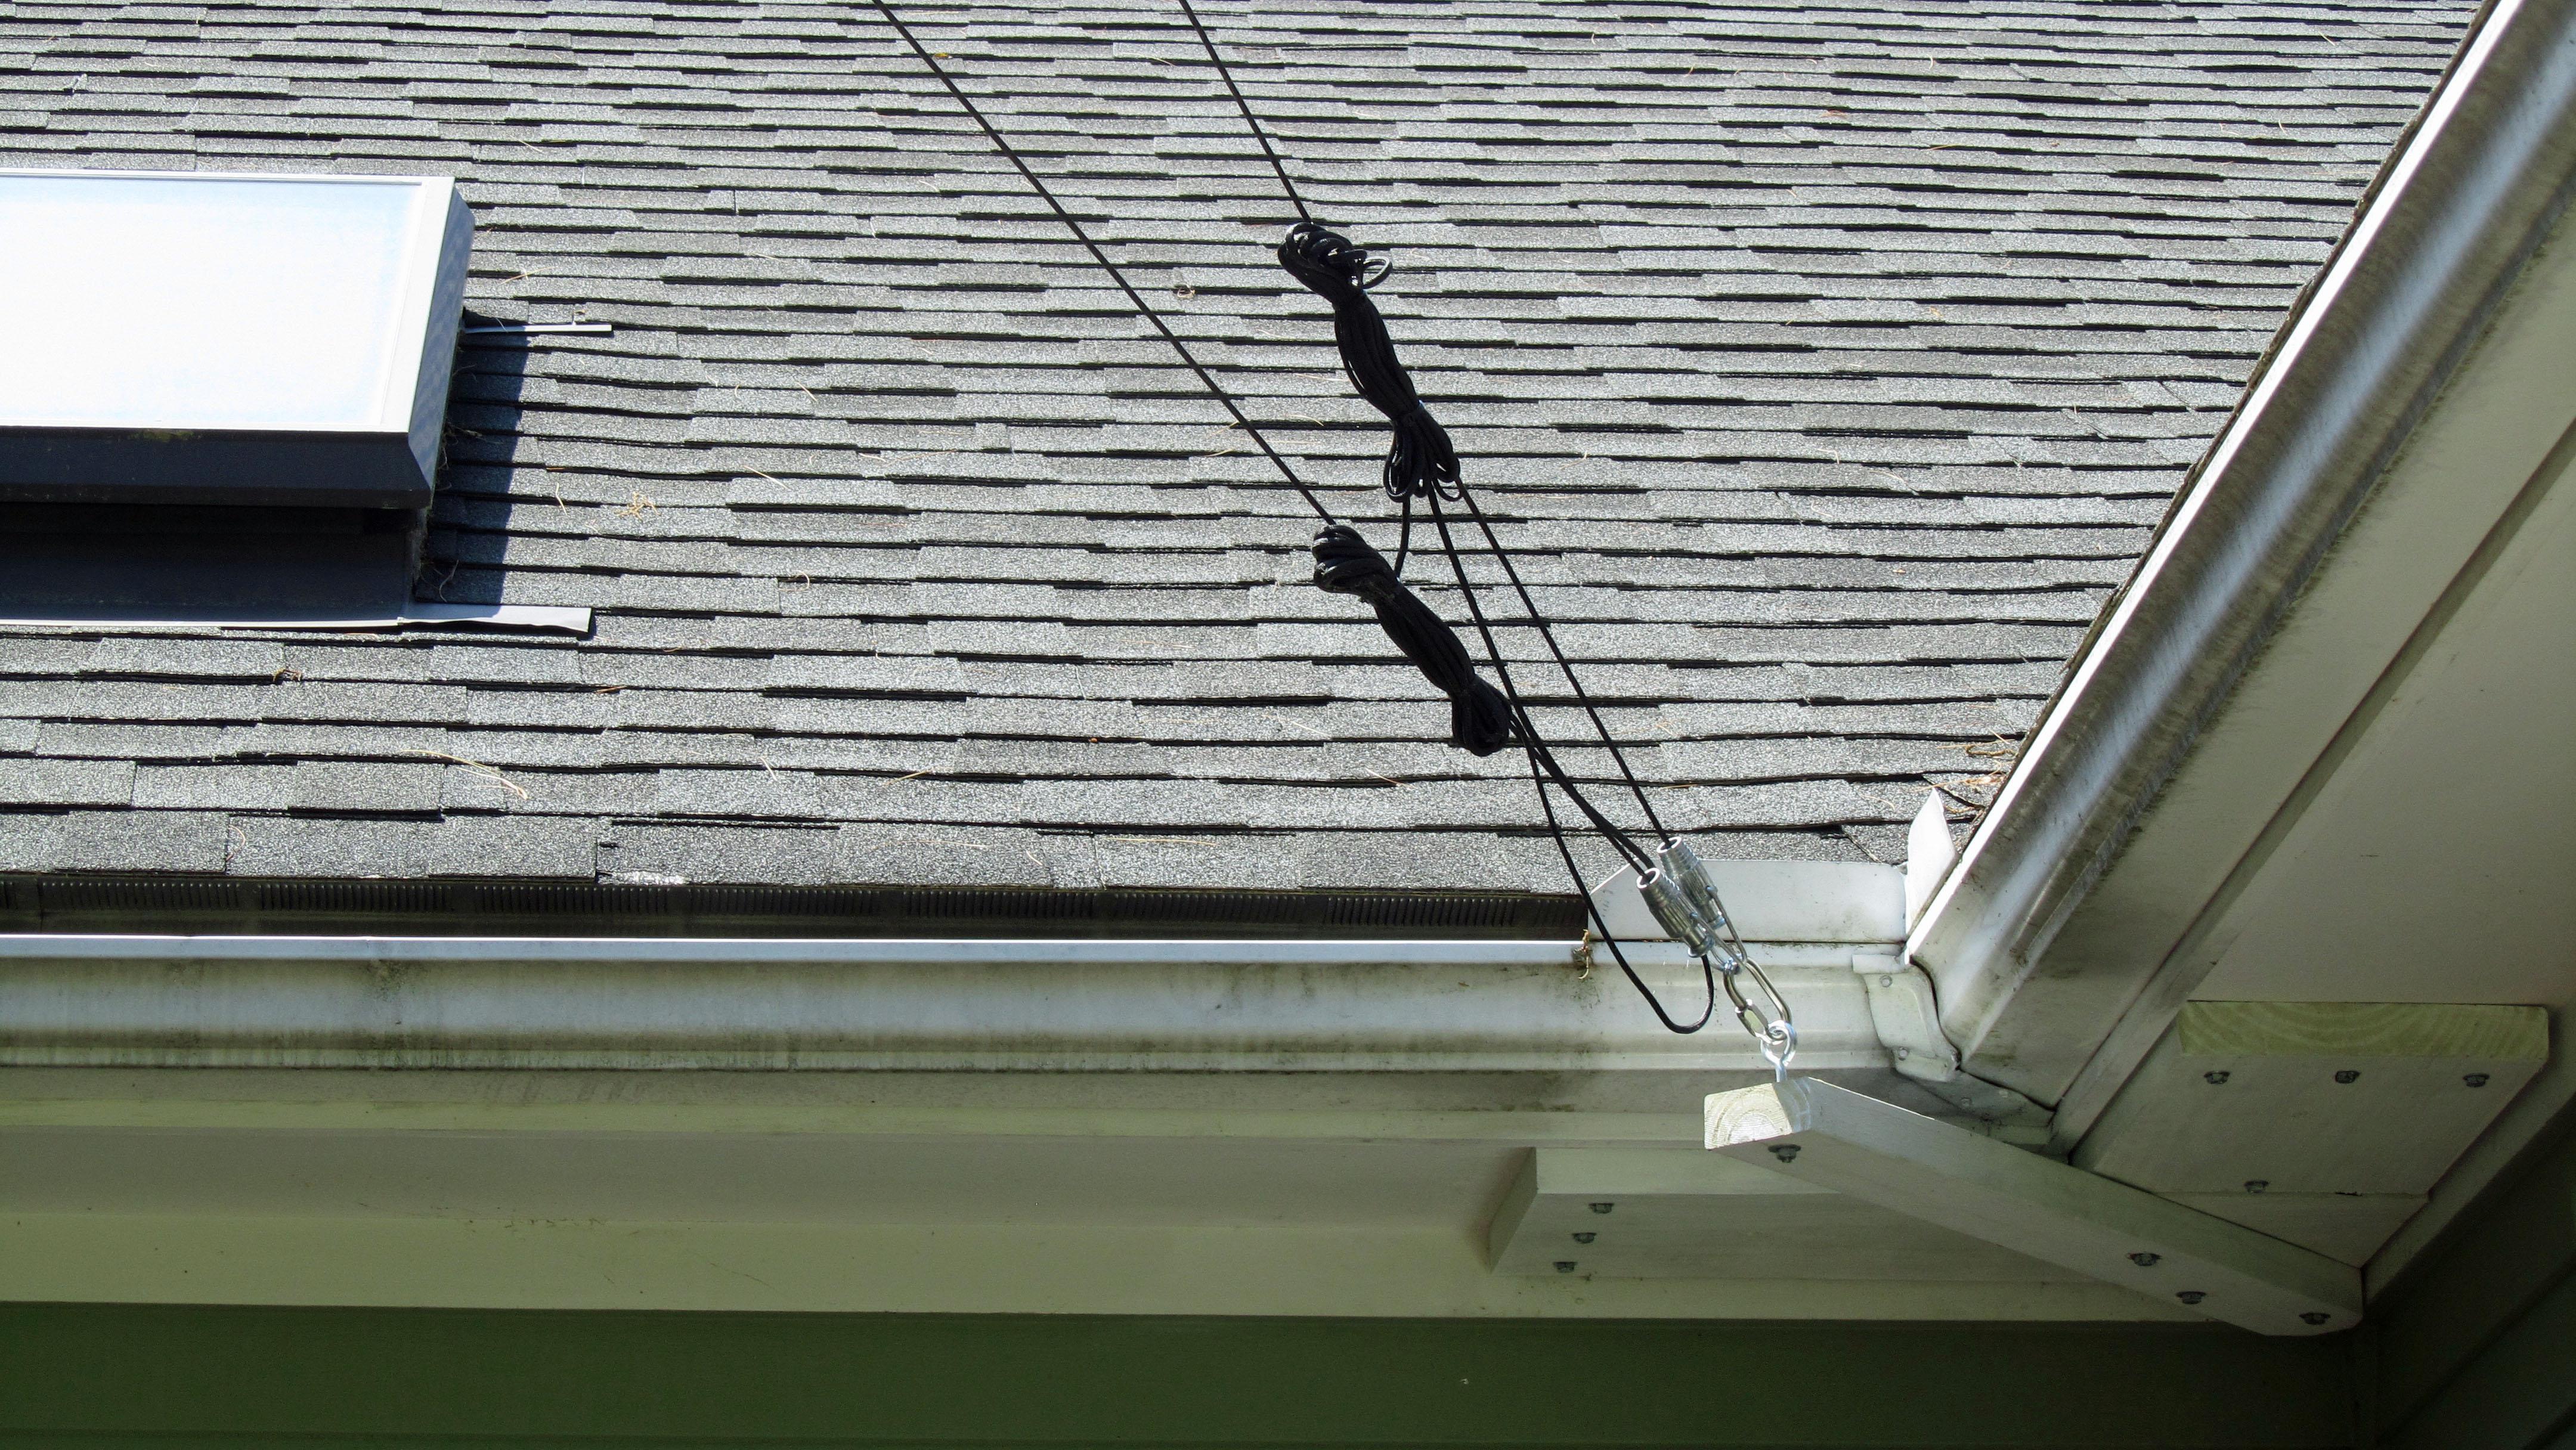 Guy Wiring House Basic Diagram Light Mast Anchor On Rh Stationproject Blog Switch